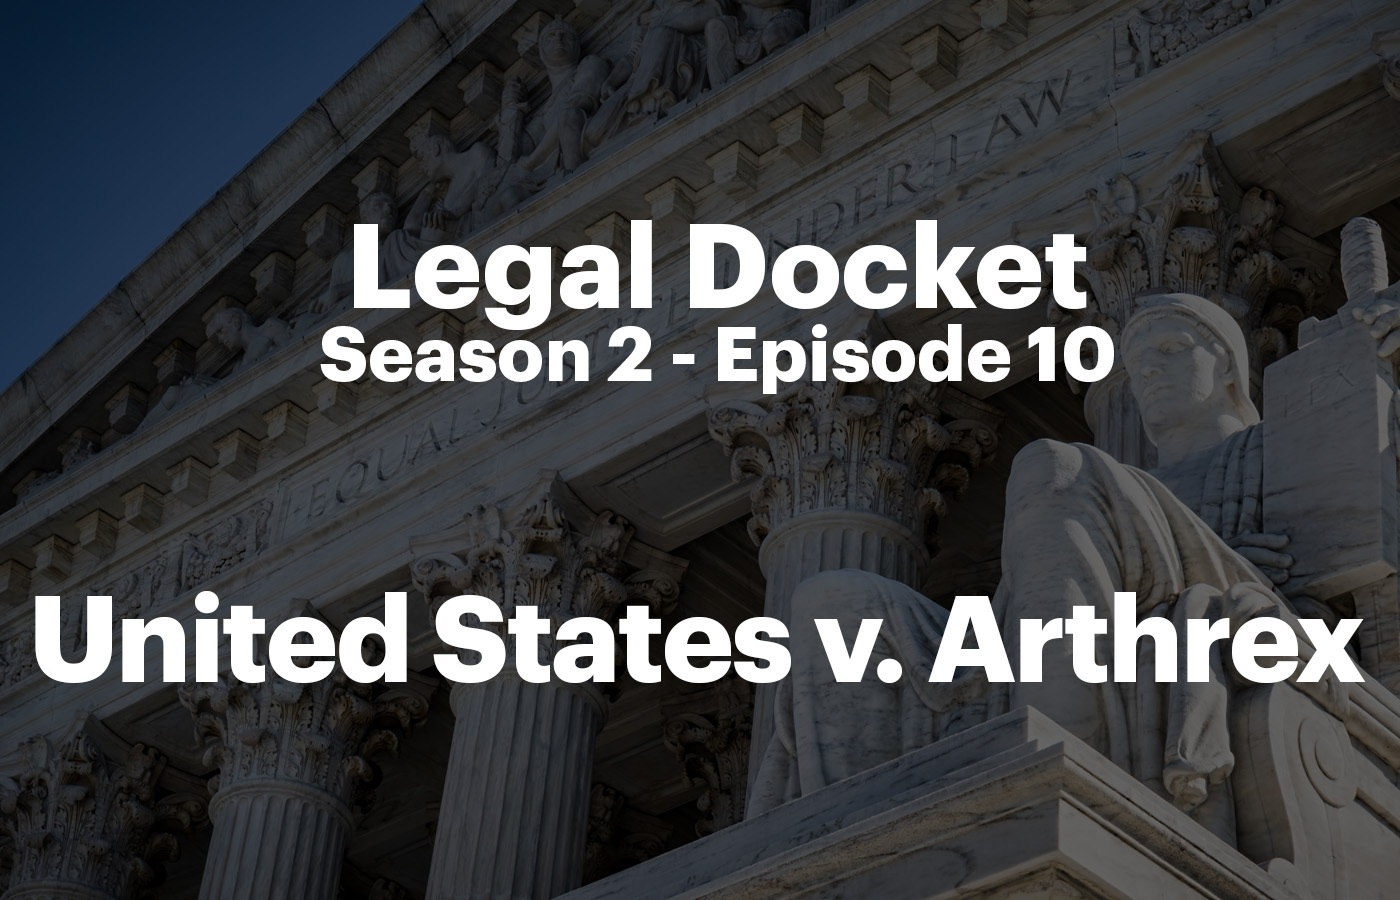 Legal Docket S2 E10